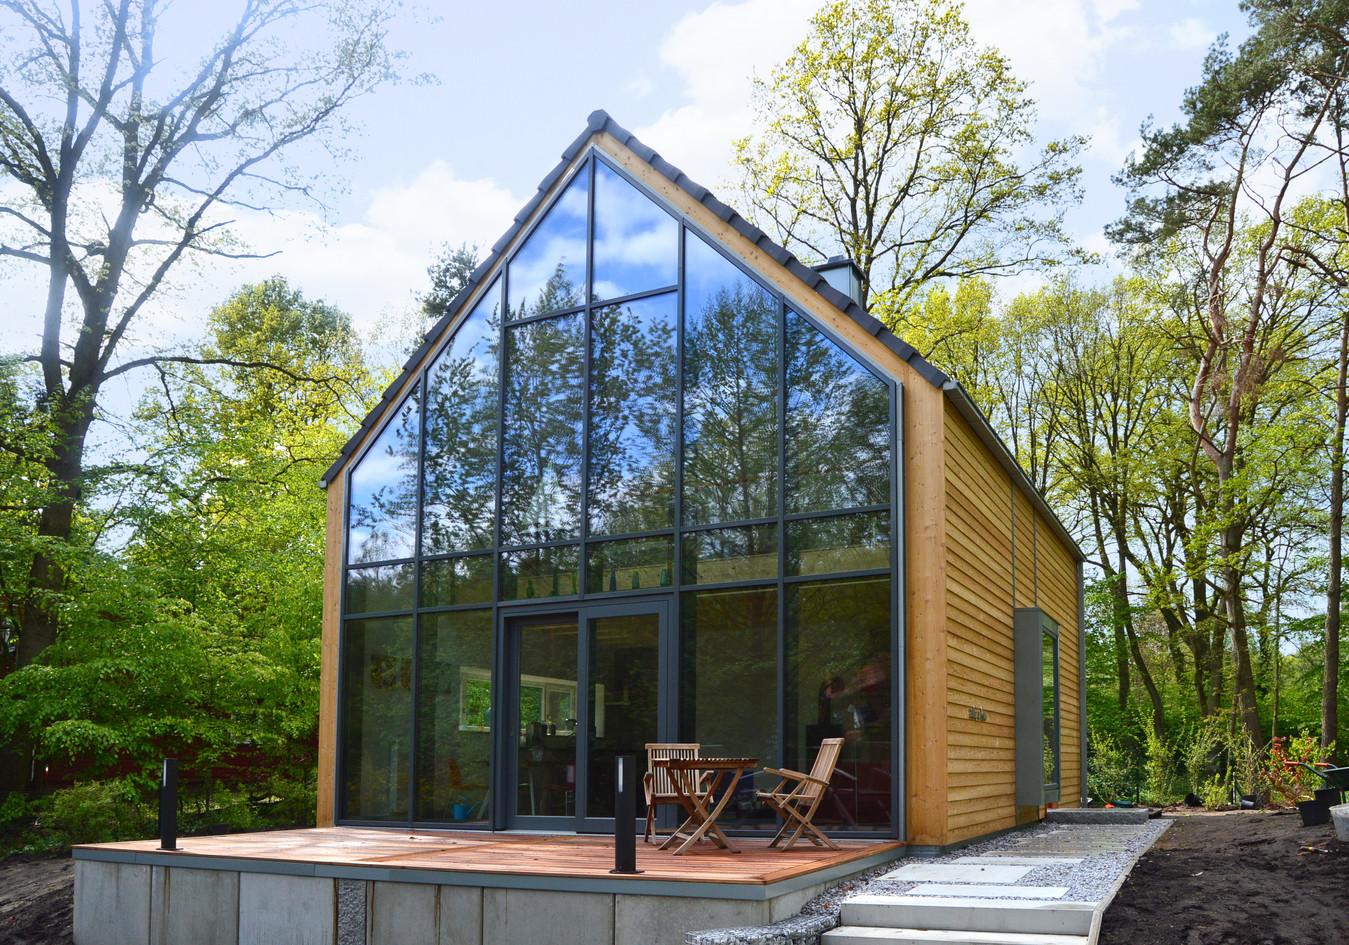 Ferienhaus in Holzrahmenbau